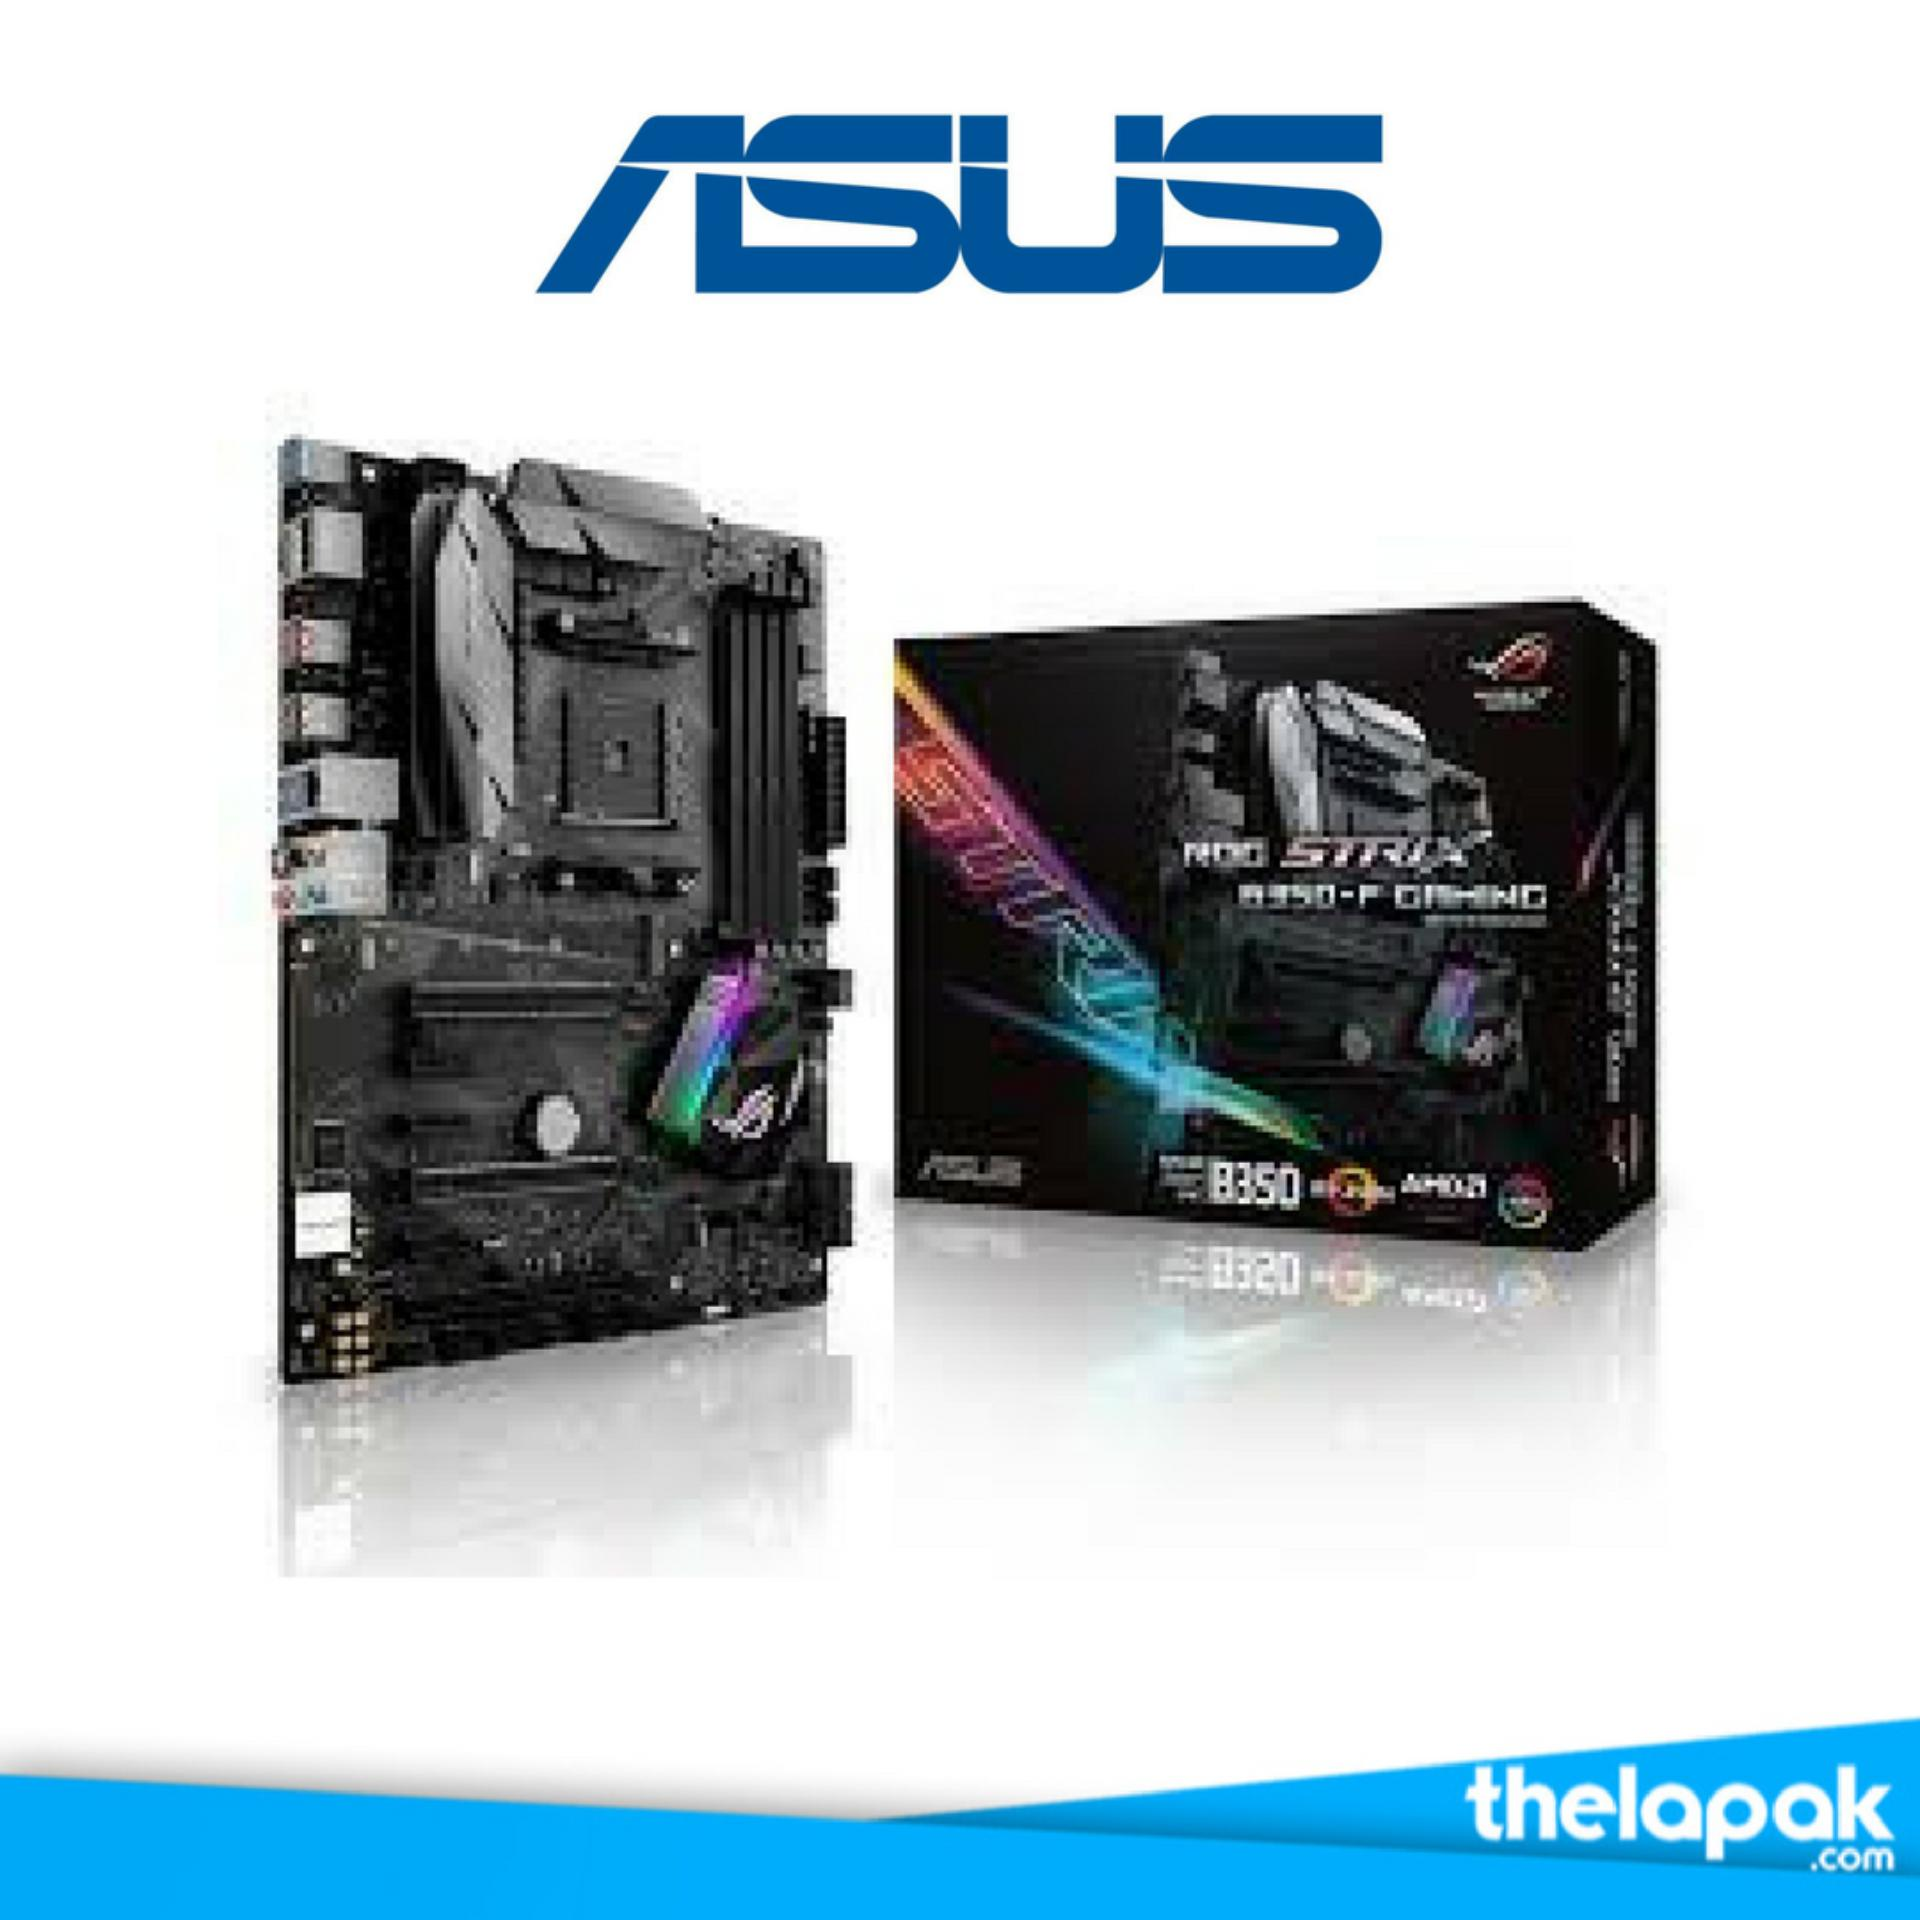 Motherboard Asus ROG B350-F Gaming